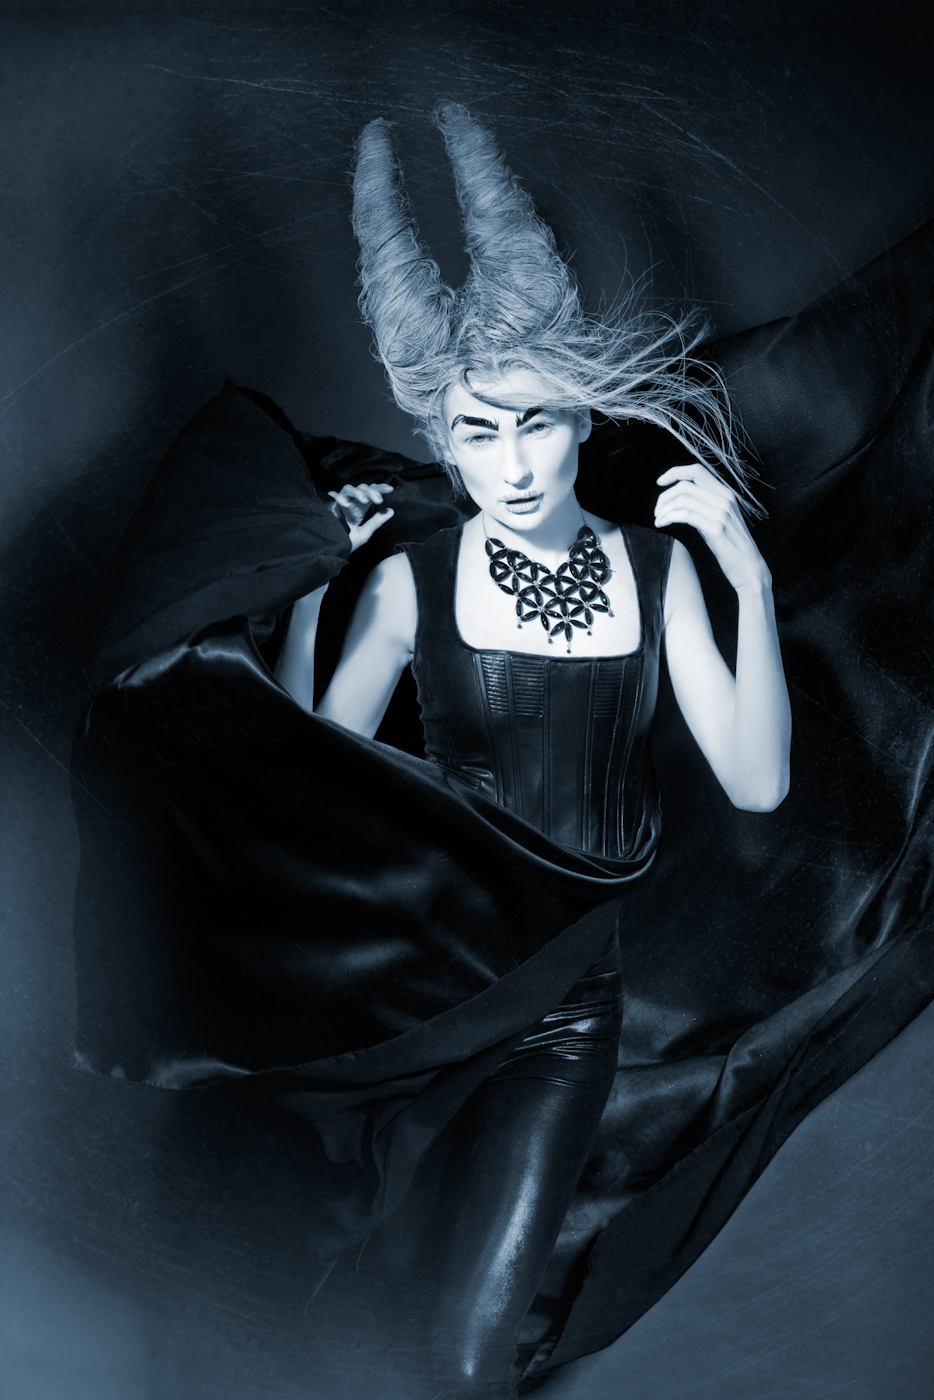 Los-Angeles-Fashion-Photographer-Avant-Garde 12.jpg